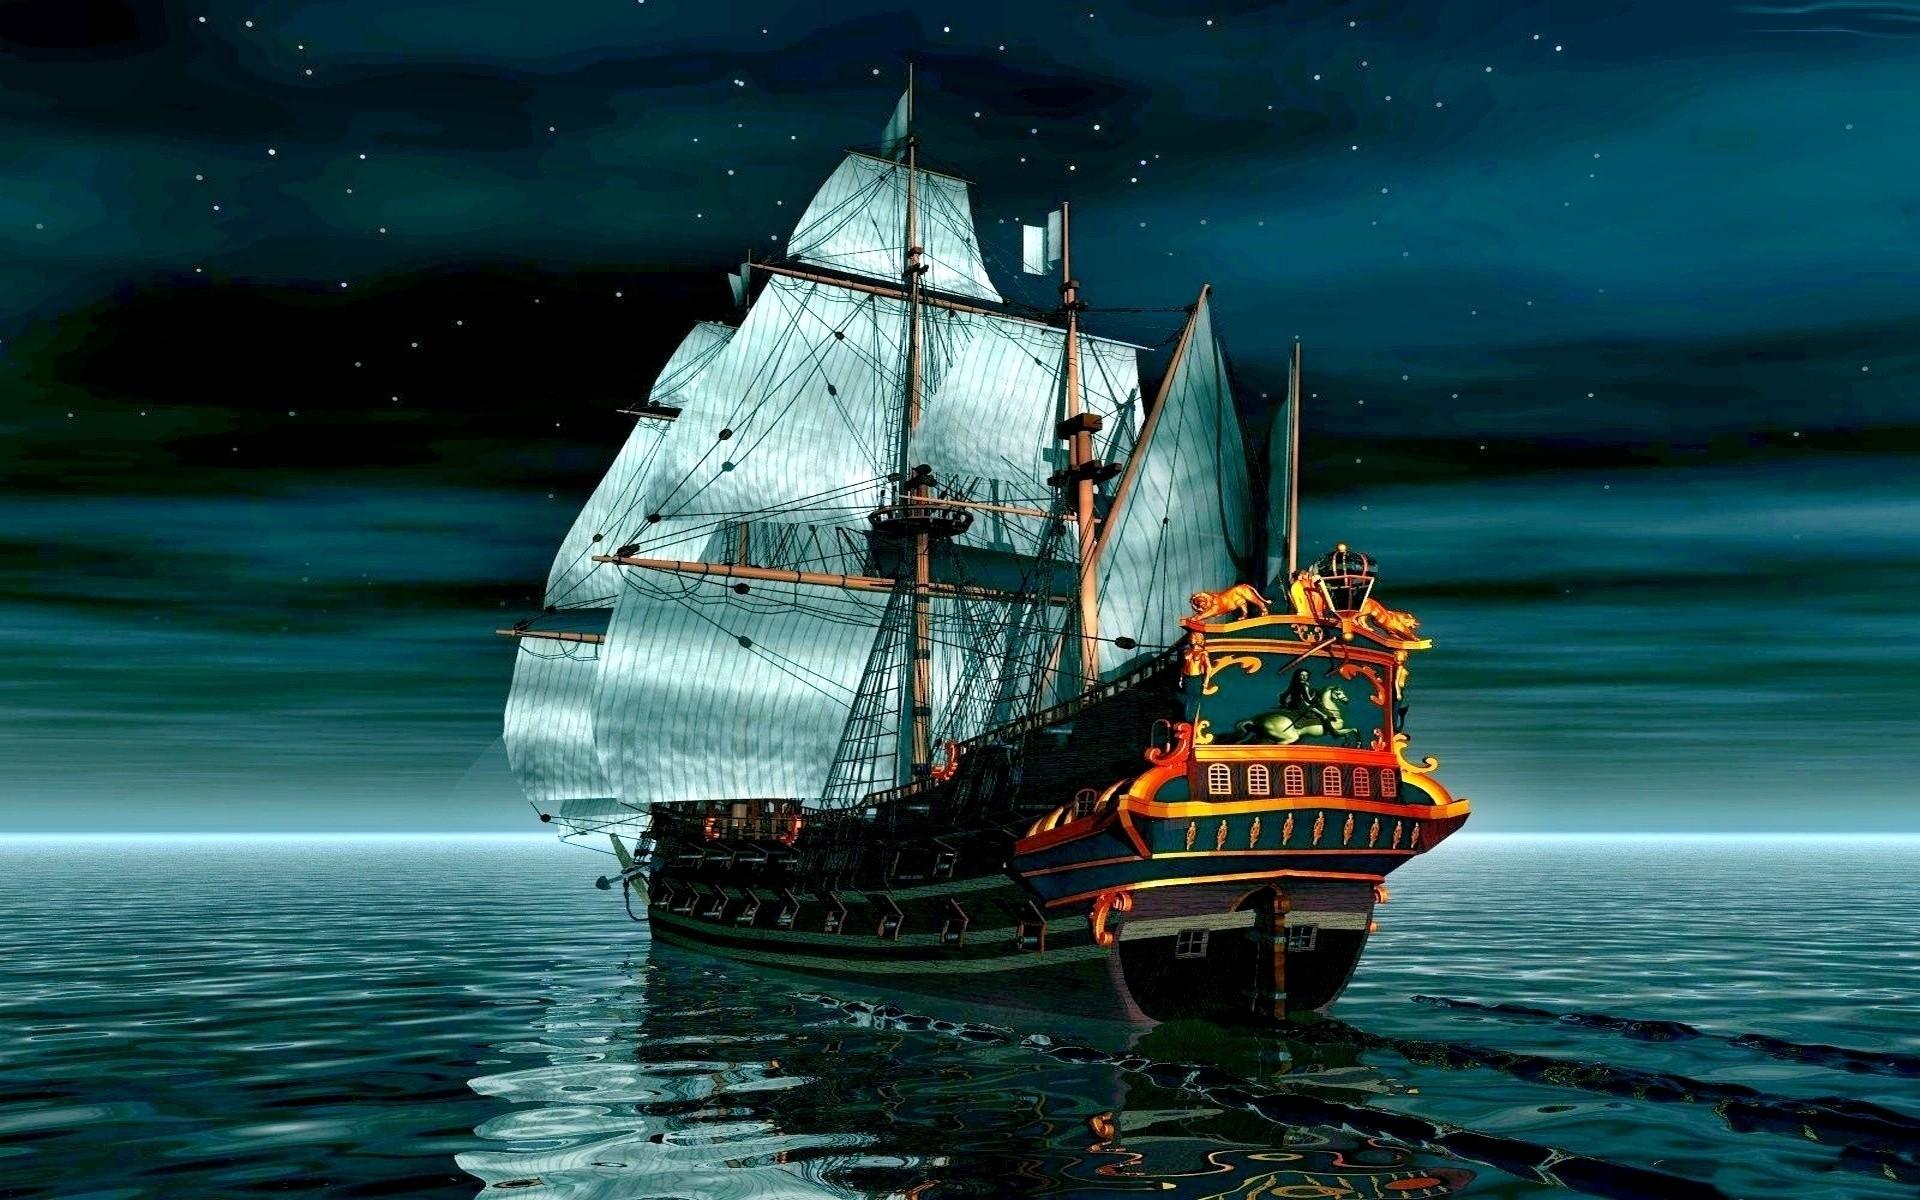 Boat night 3d ship ocean wallpaper     50141   WallpaperUP